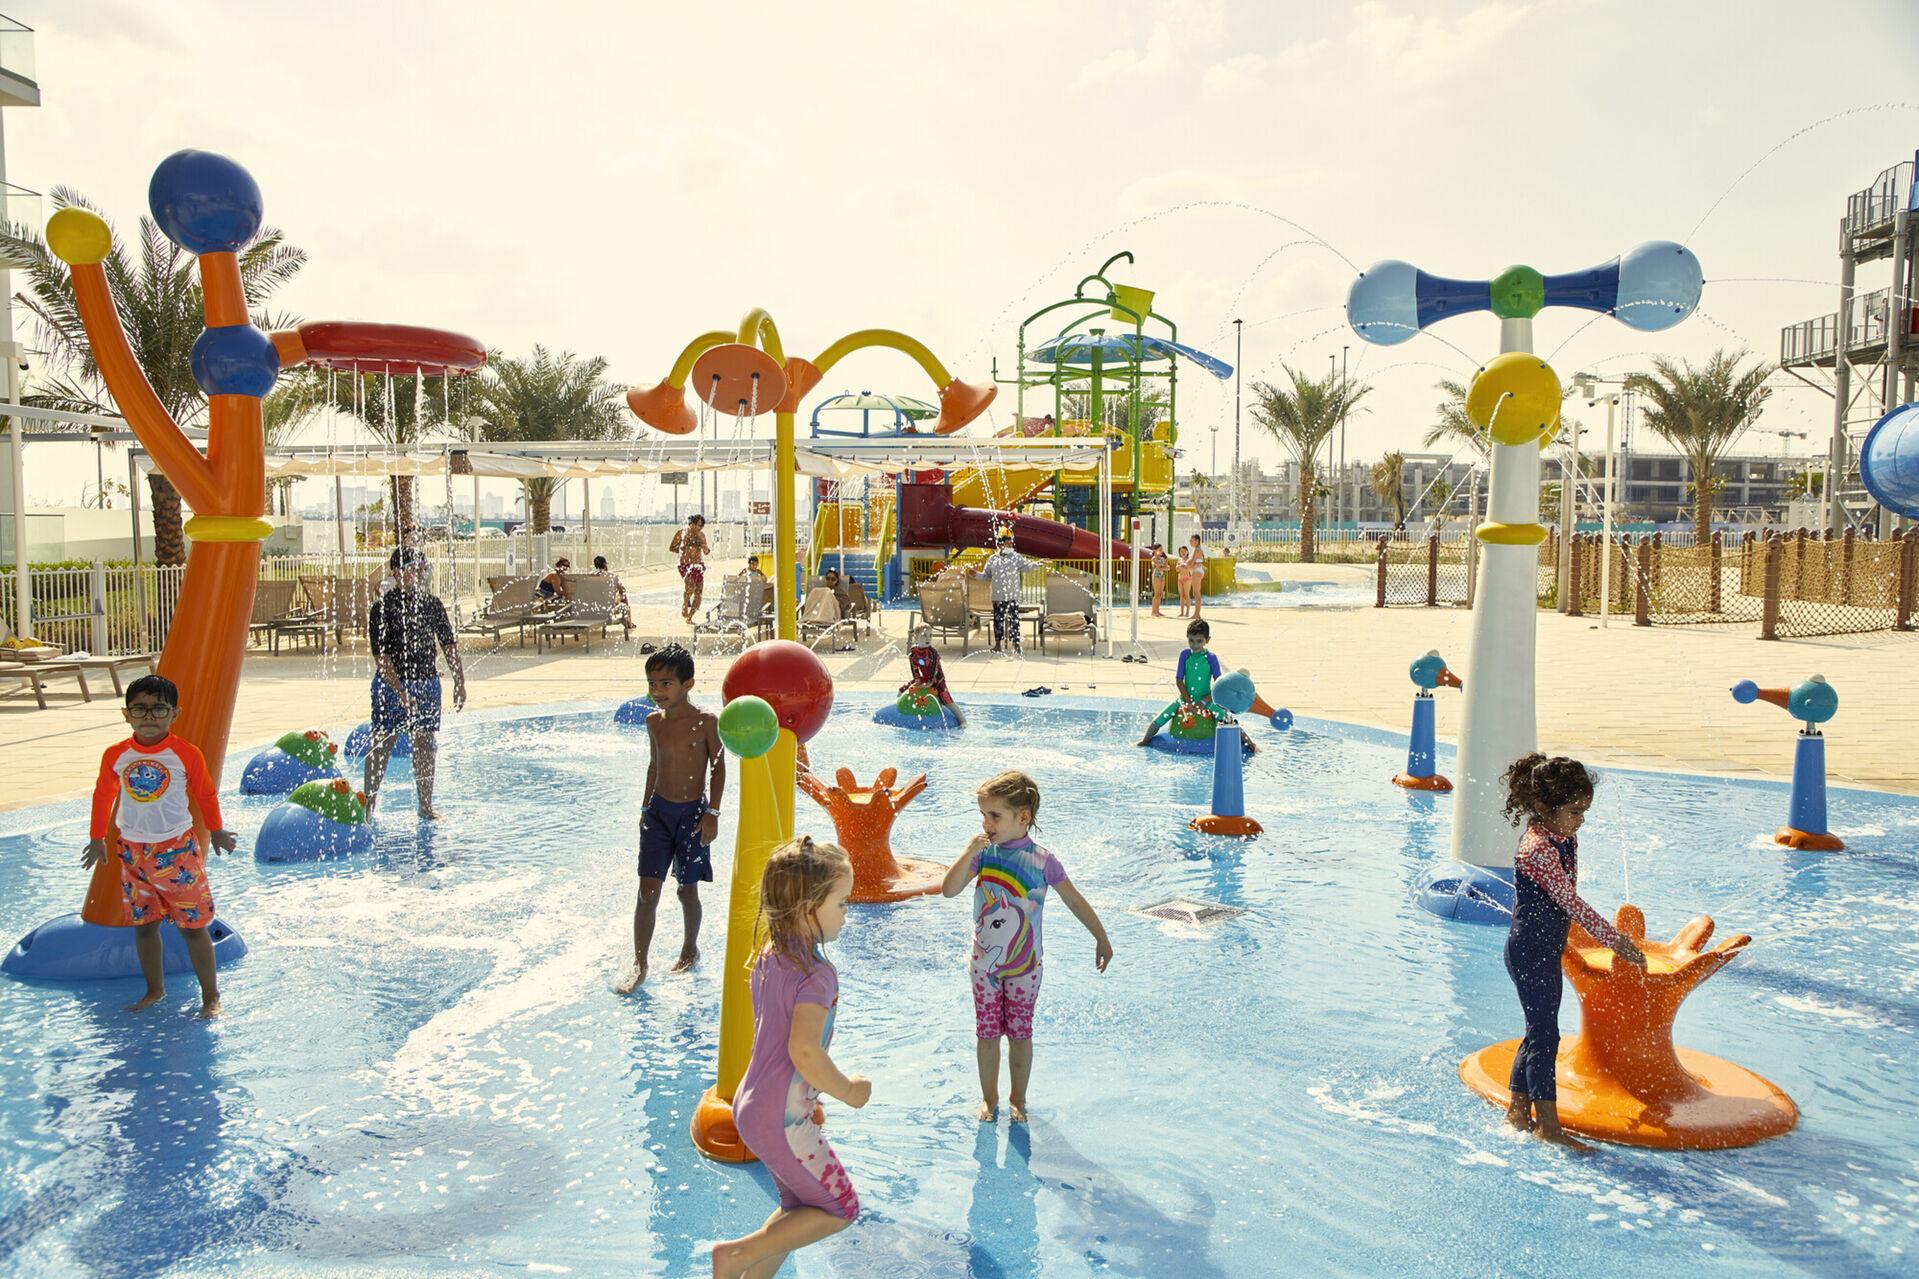 https://cms.satur.sk/data/imgs/tour_image/orig/dub_20_036-splash-childrens-playground-1939865.jpg